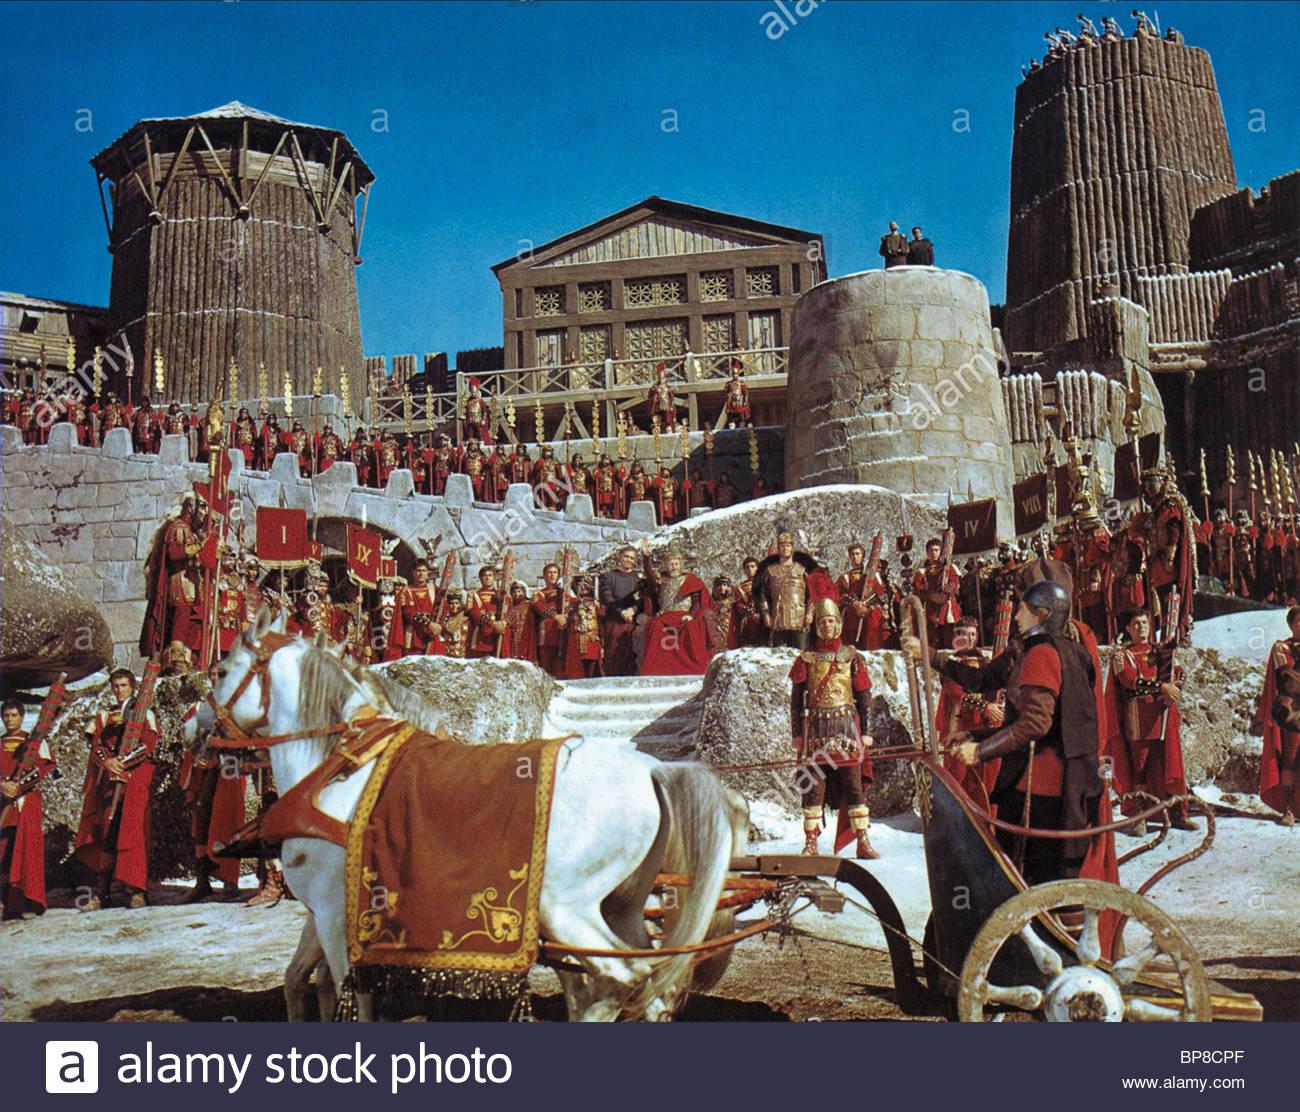 james mason amp alec guinness the fall of the roman empire